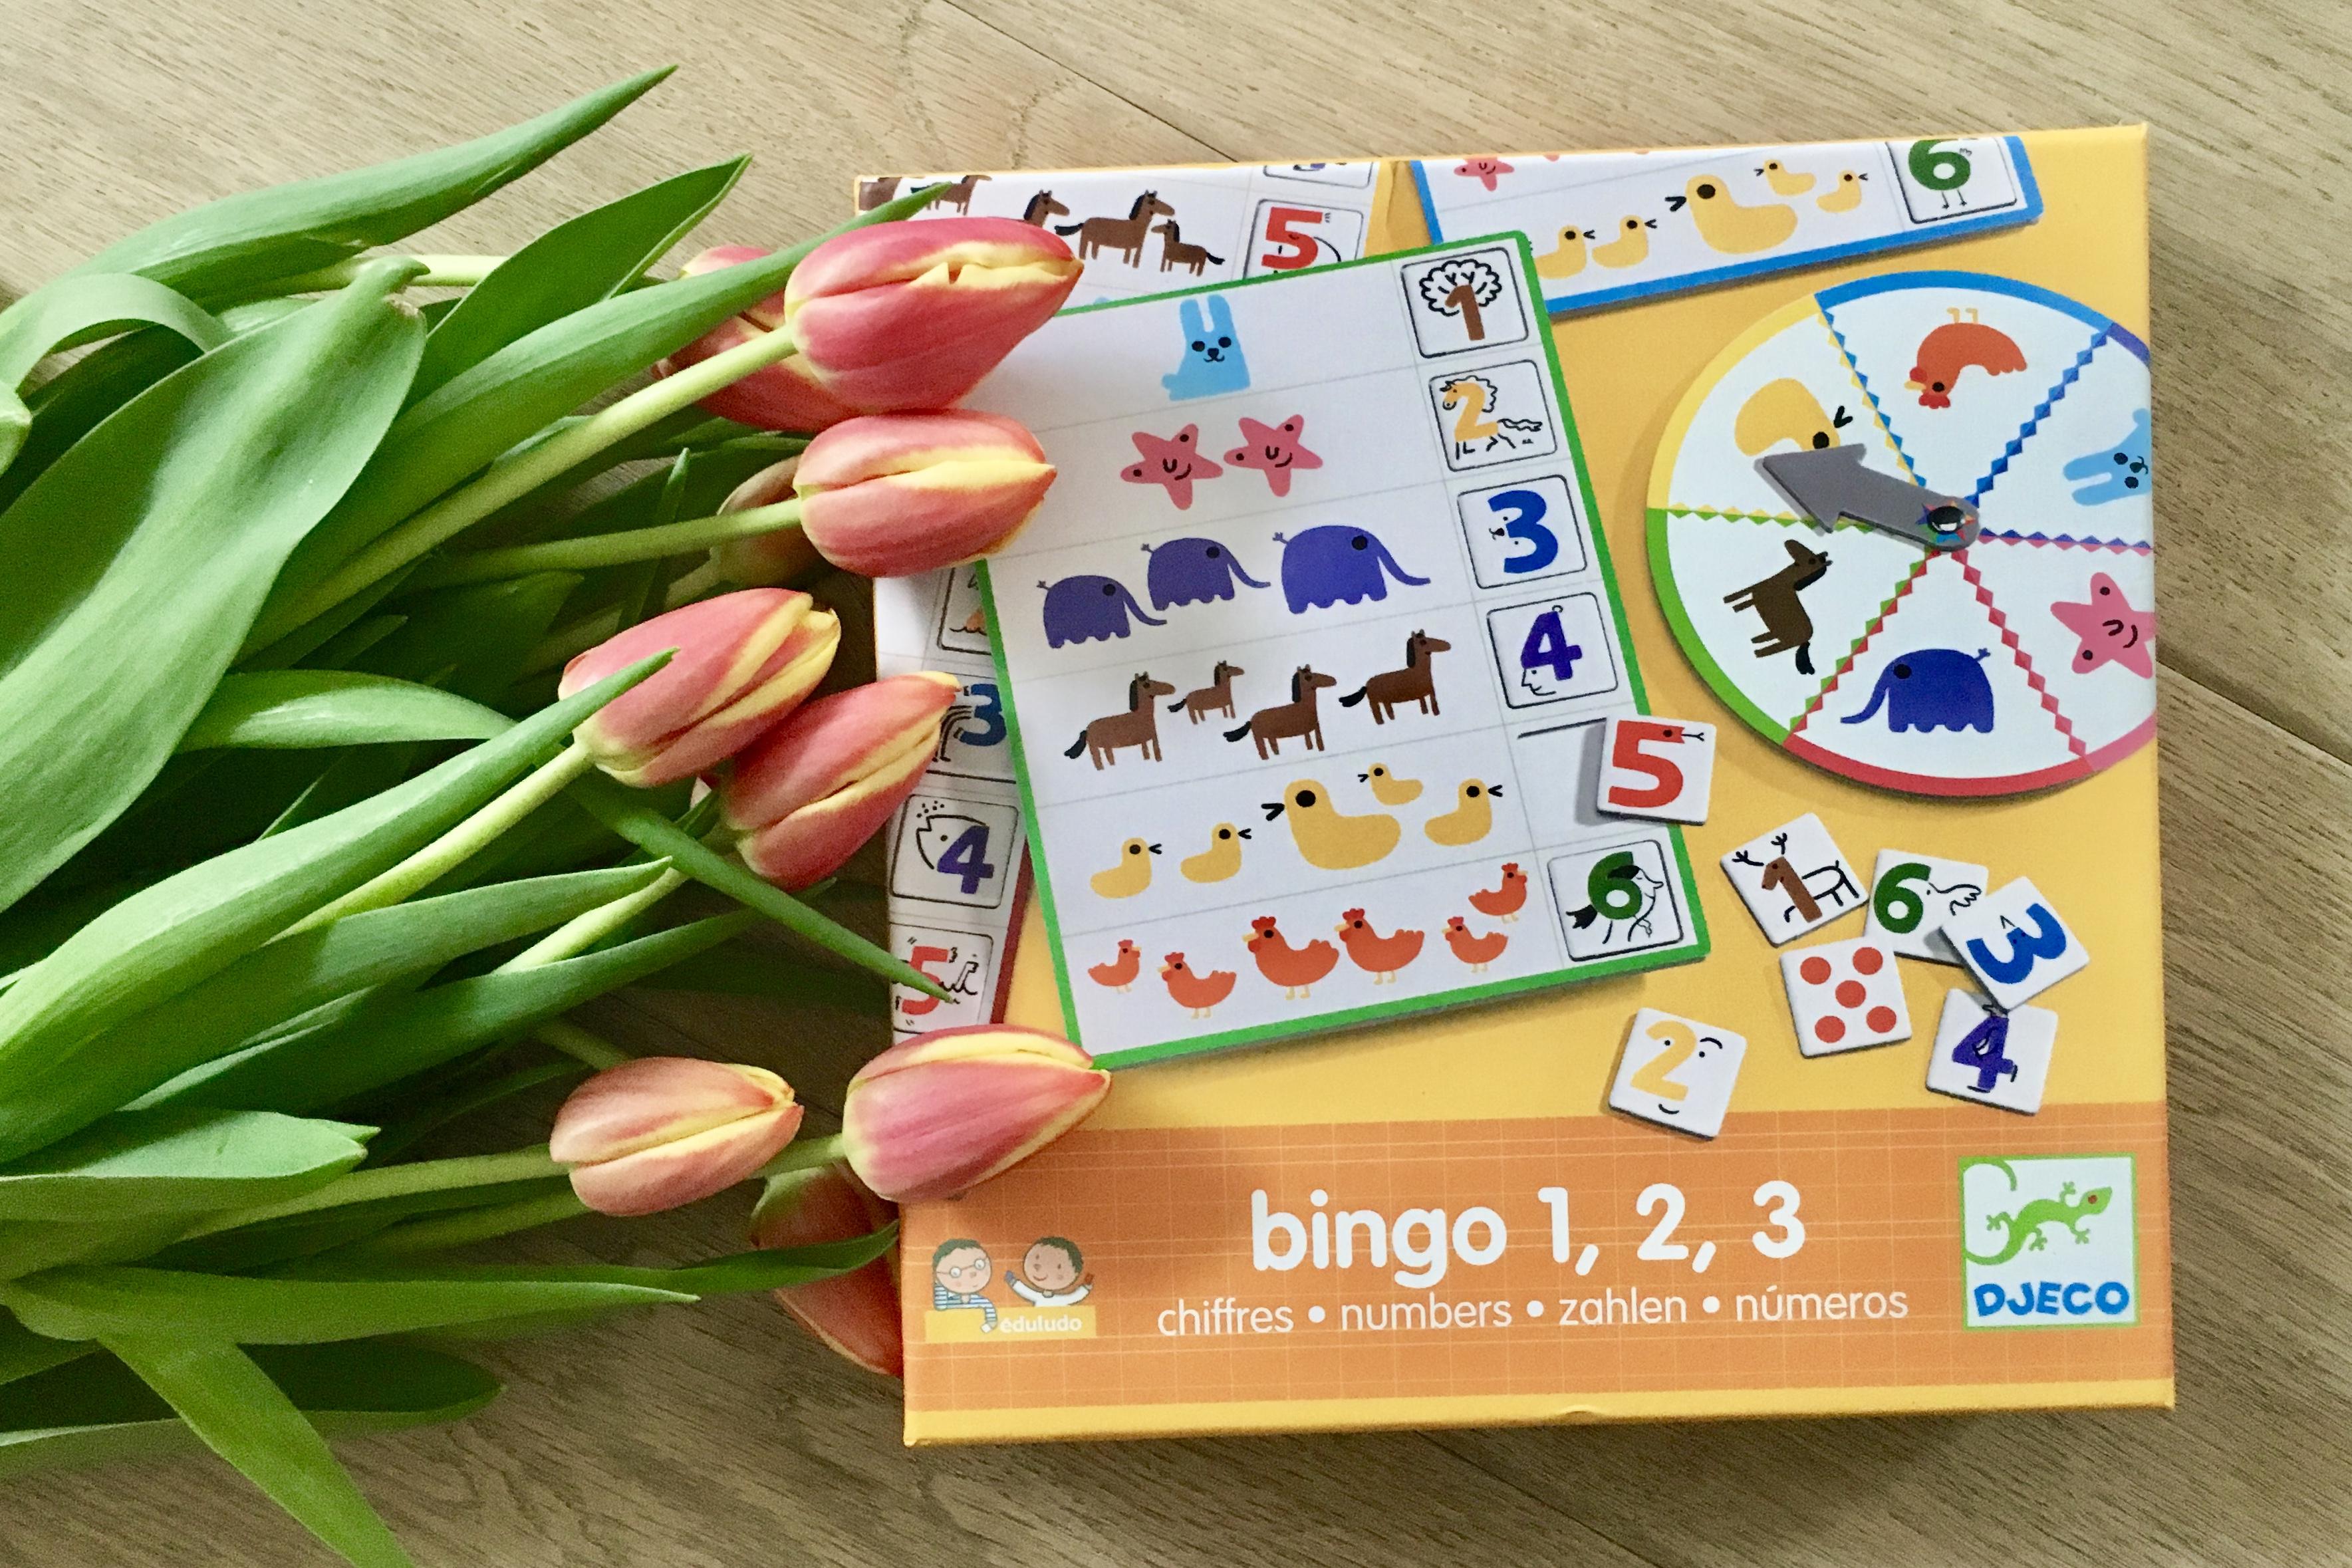 bingo 1,2,3 - Zahlen